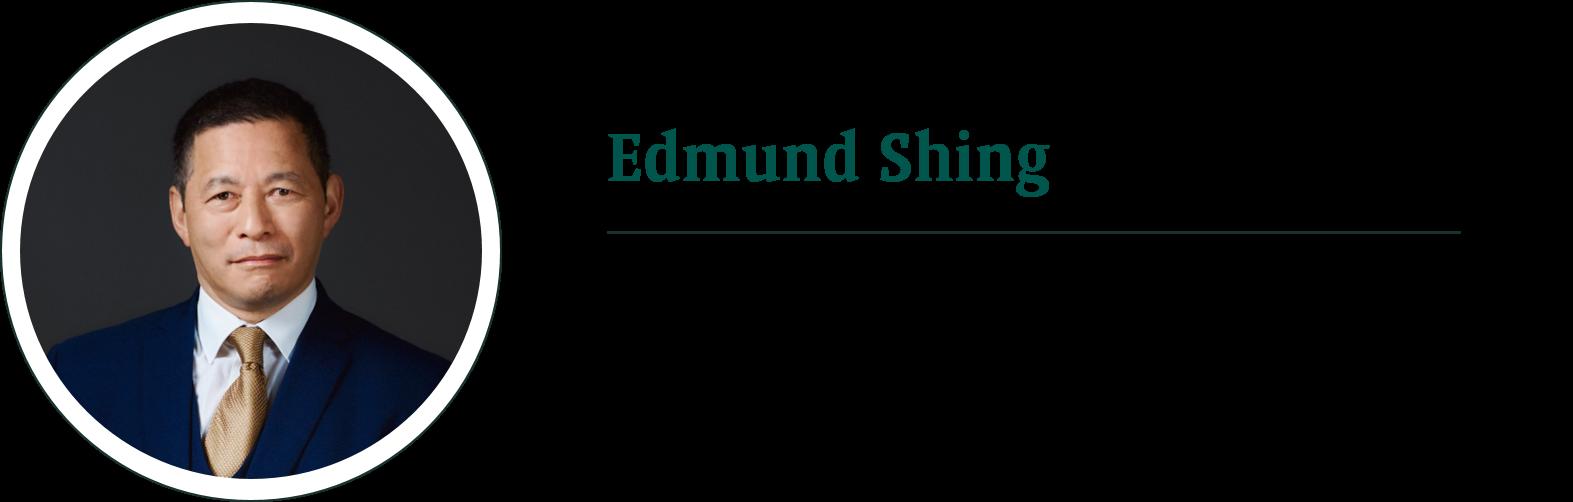 Edmund Shing